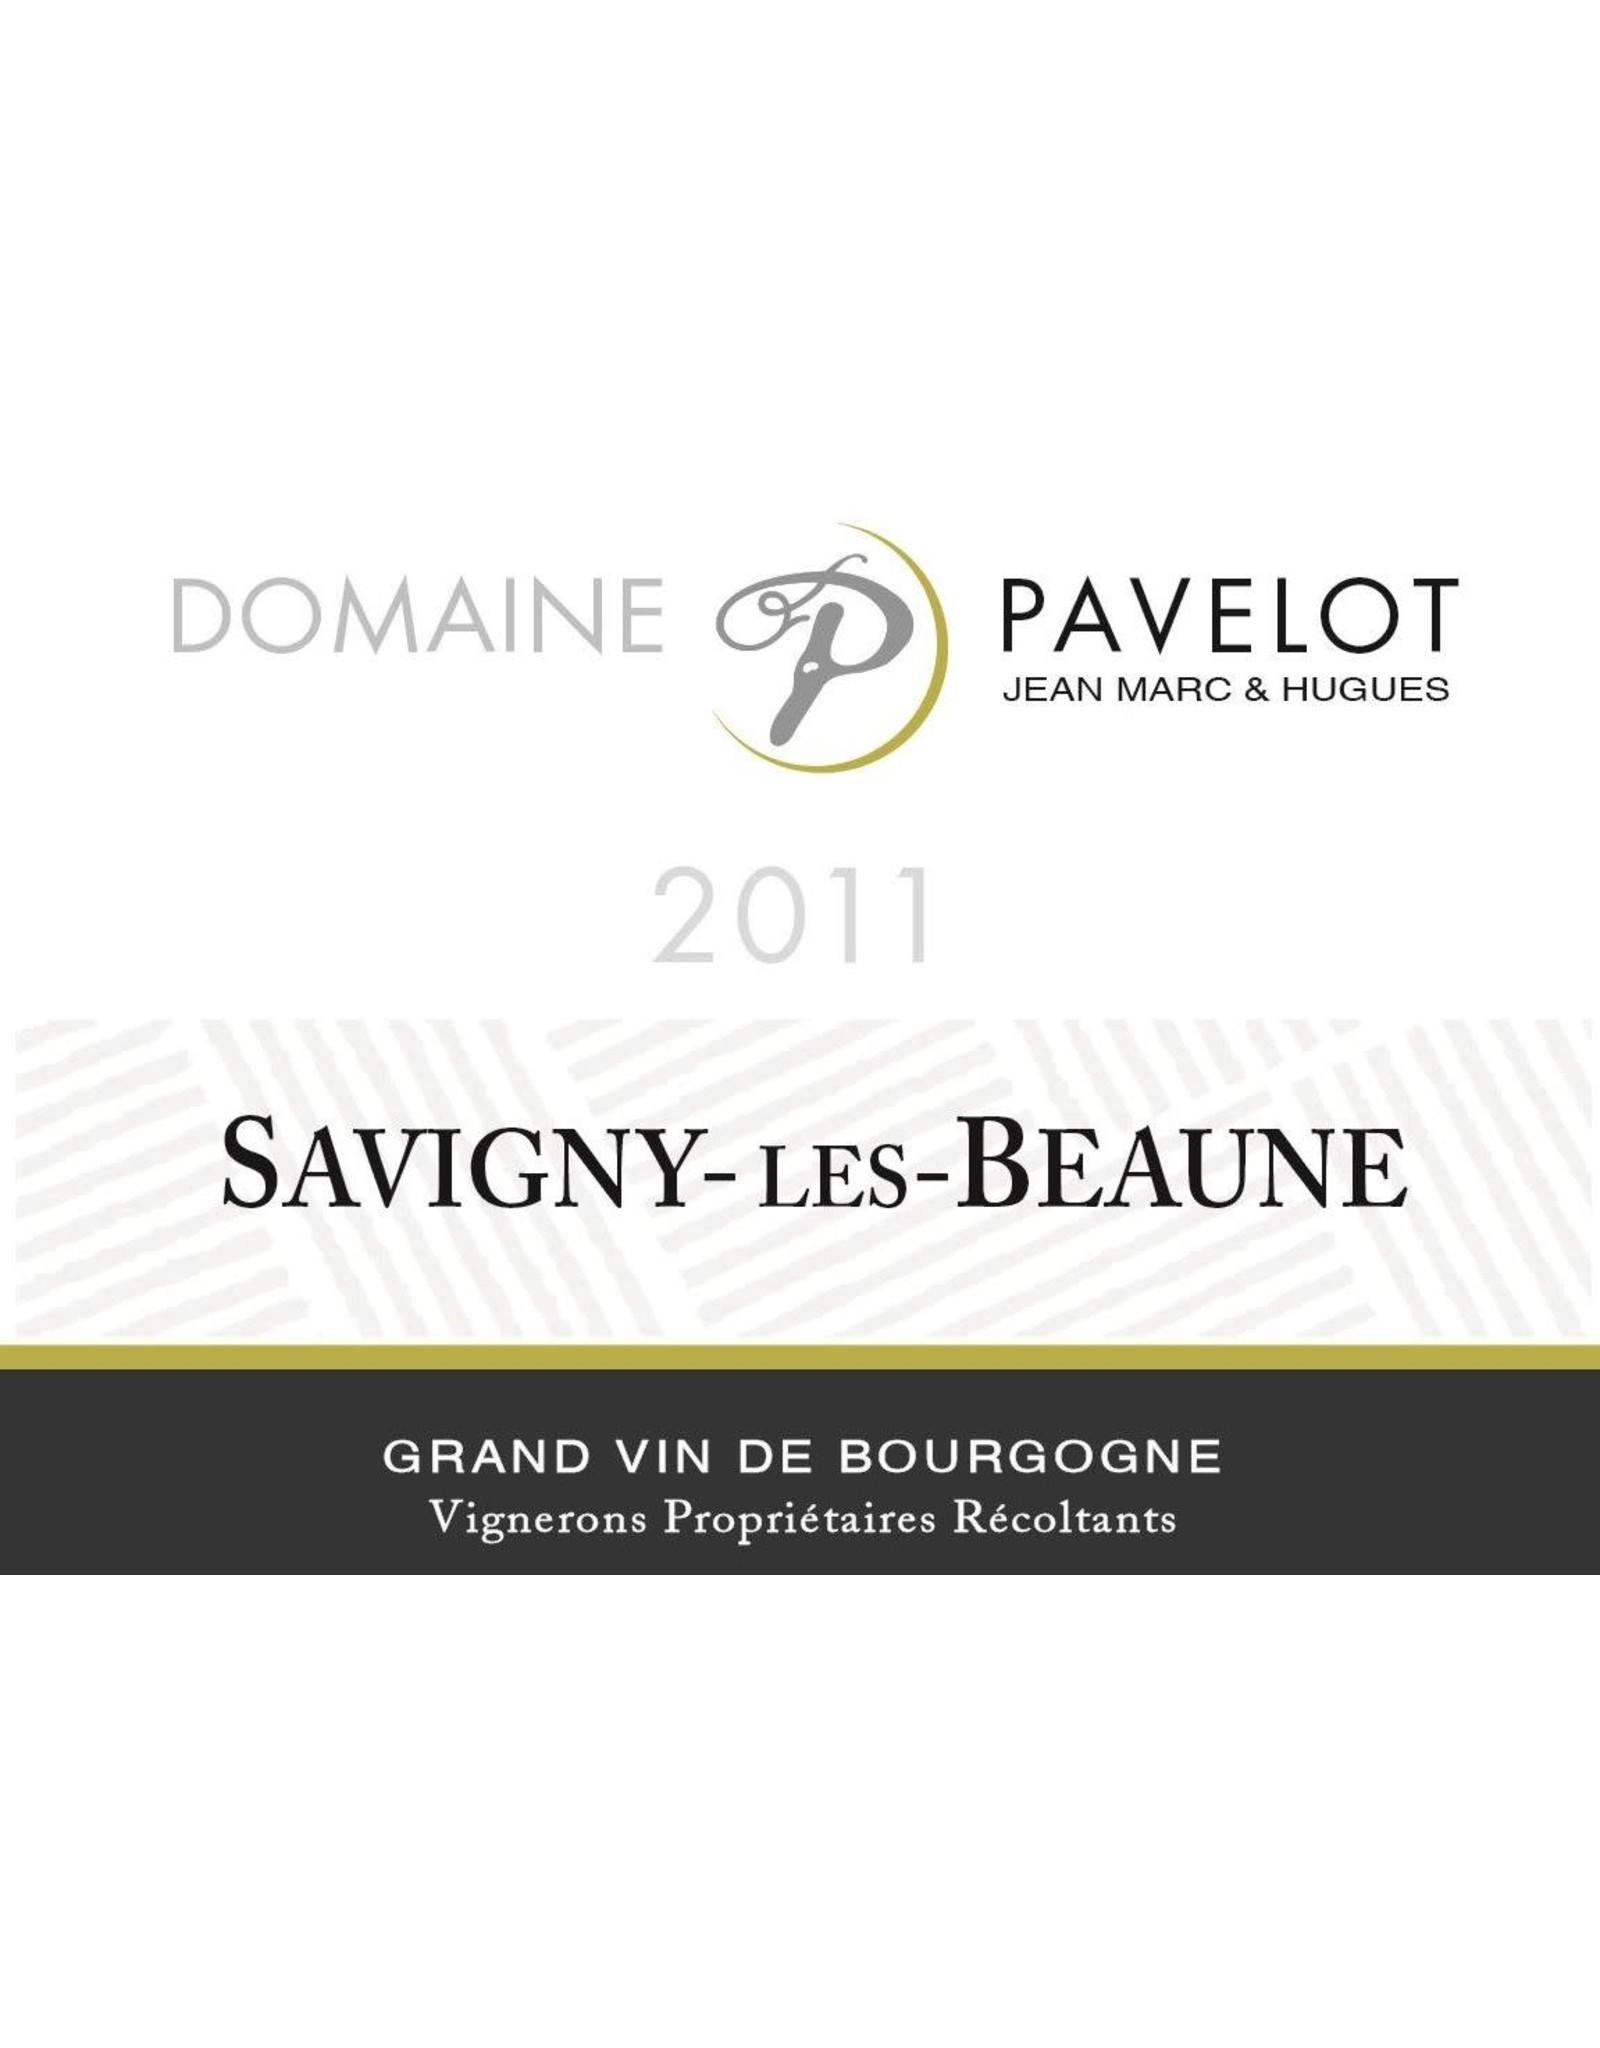 Domaine Pavelot Savigny-les-Beaune 2014